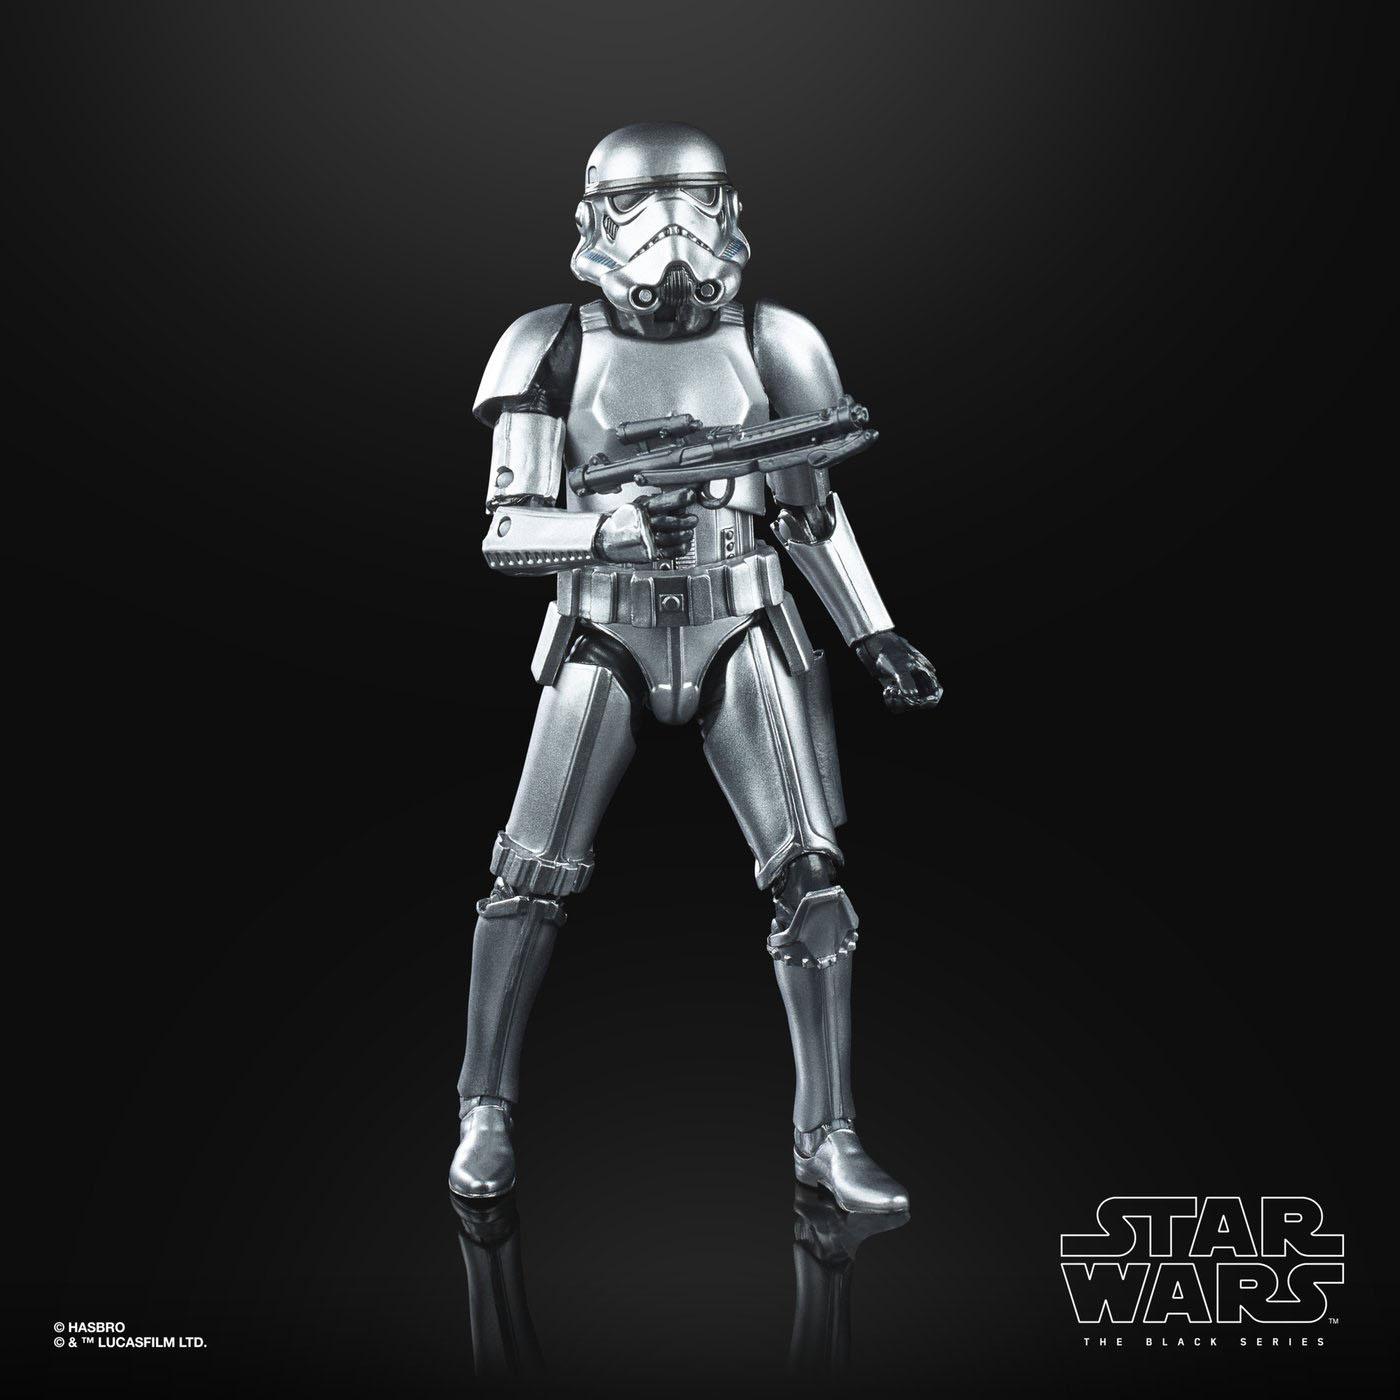 Star-Wars-Black-Series-Carbonized-Stormtrooper-002